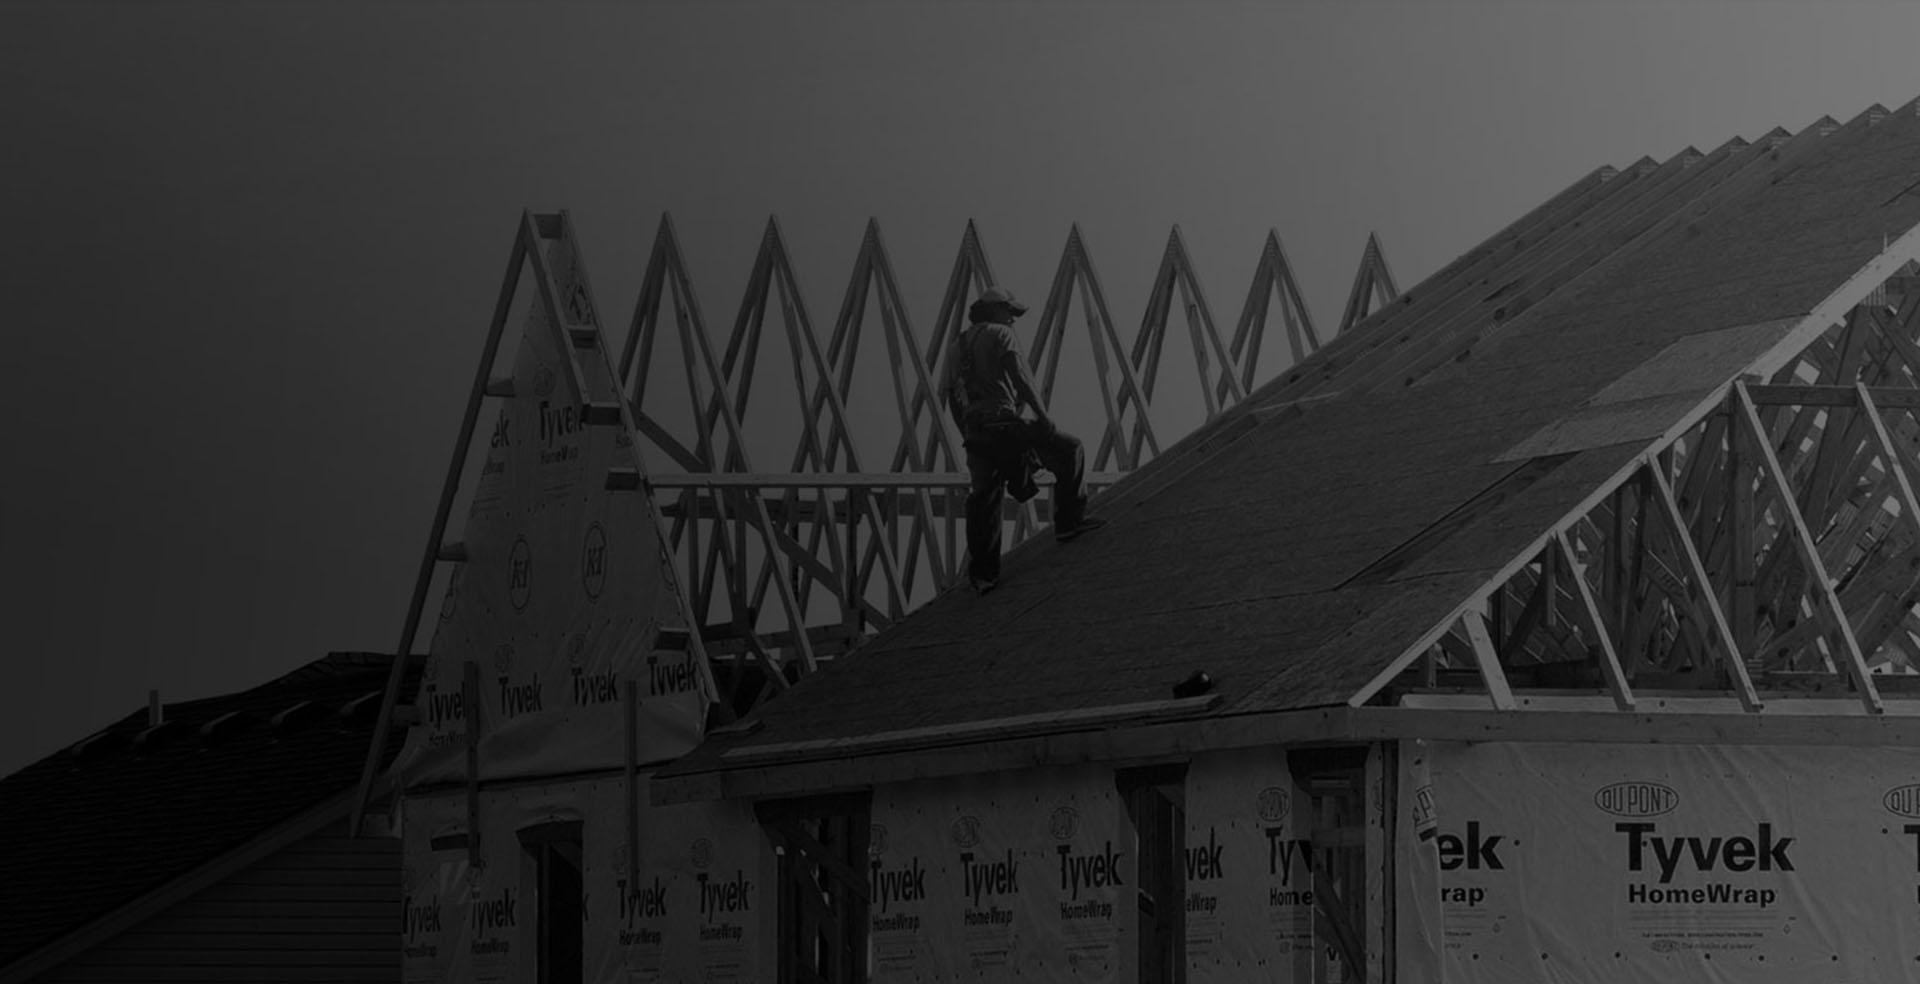 Builder and Remodeler Project Management Software